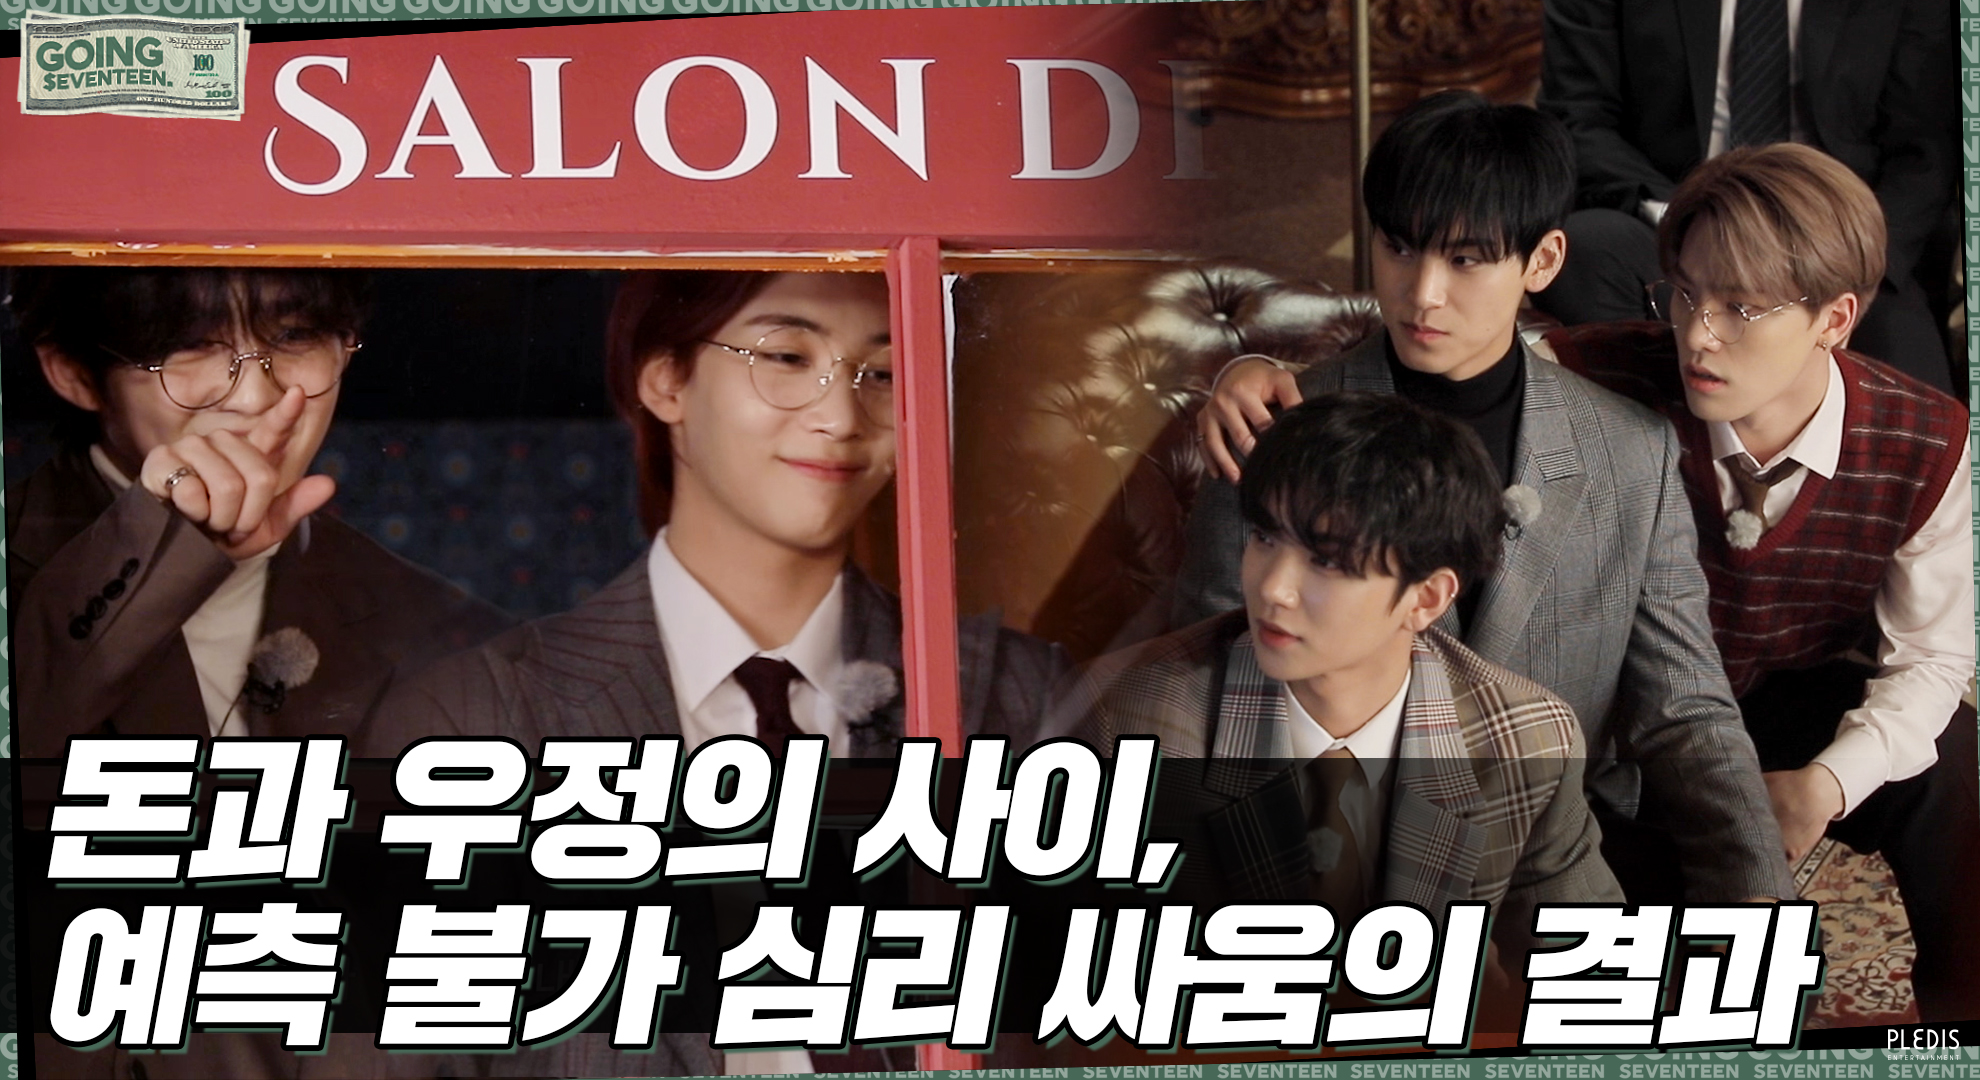 [GOING SEVENTEEN] EP.4 100만 원 #2 (ONE MILLION WON #2)